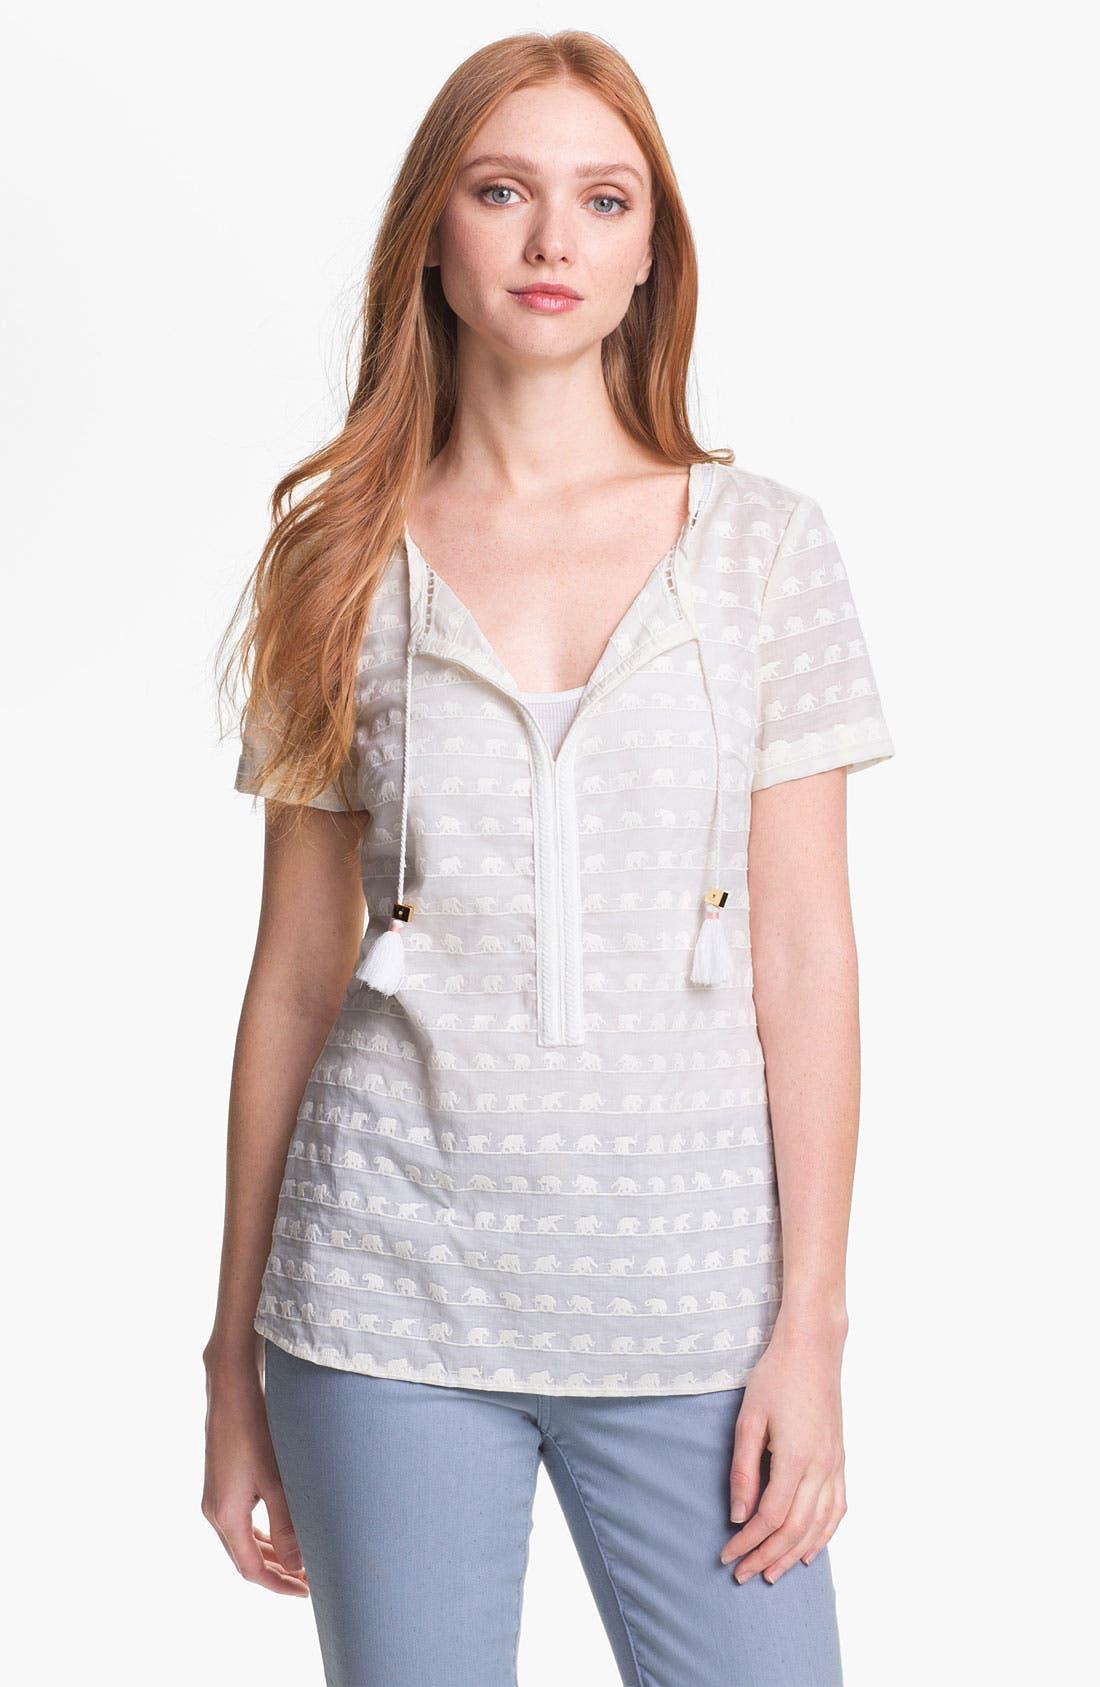 Main Image - Tory Burch 'Maxon' Cotton Top